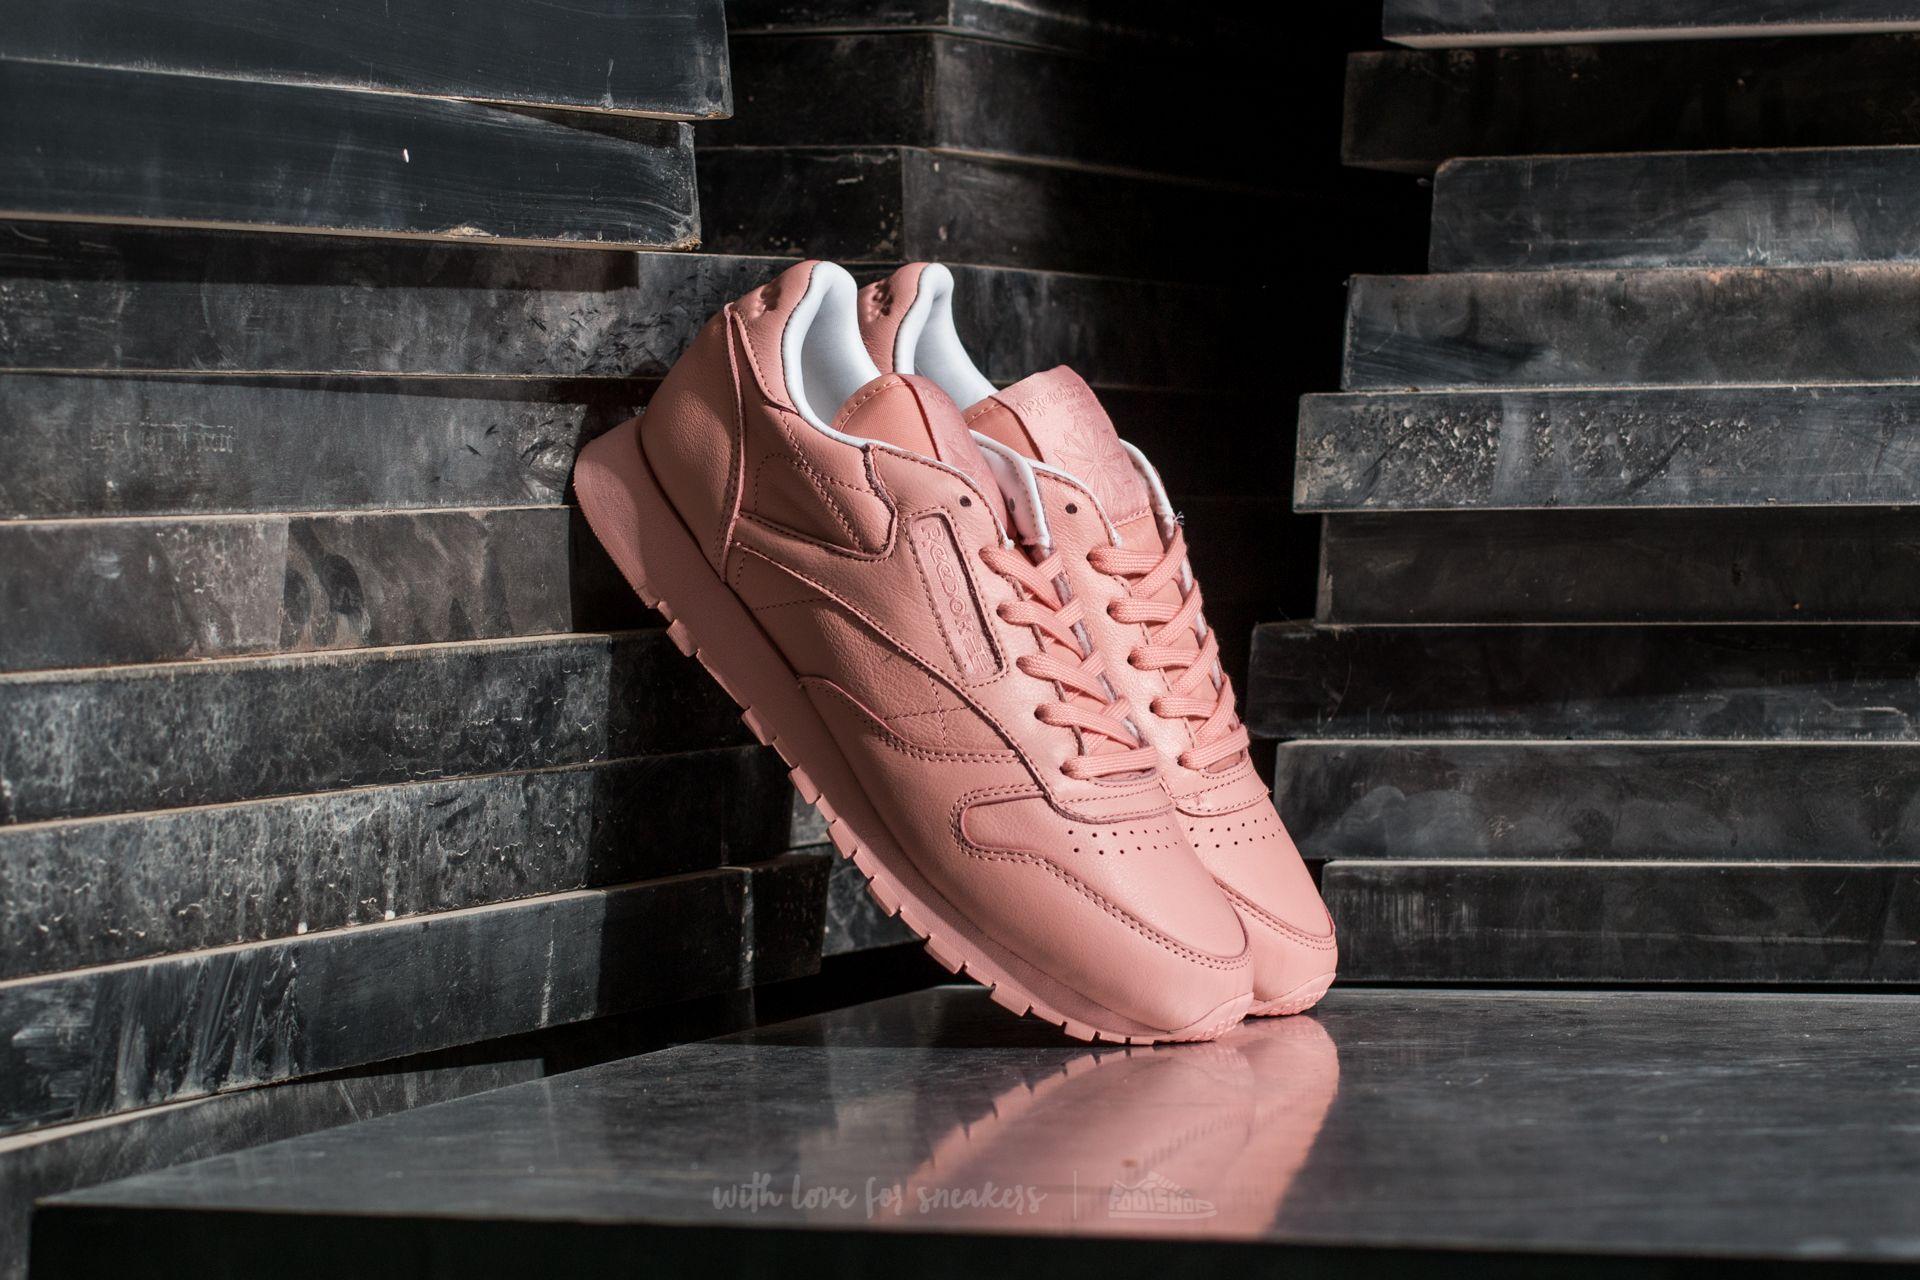 cbf1fc8dffe850 Reebok Classic Leather Pastels W Platina Pink  White